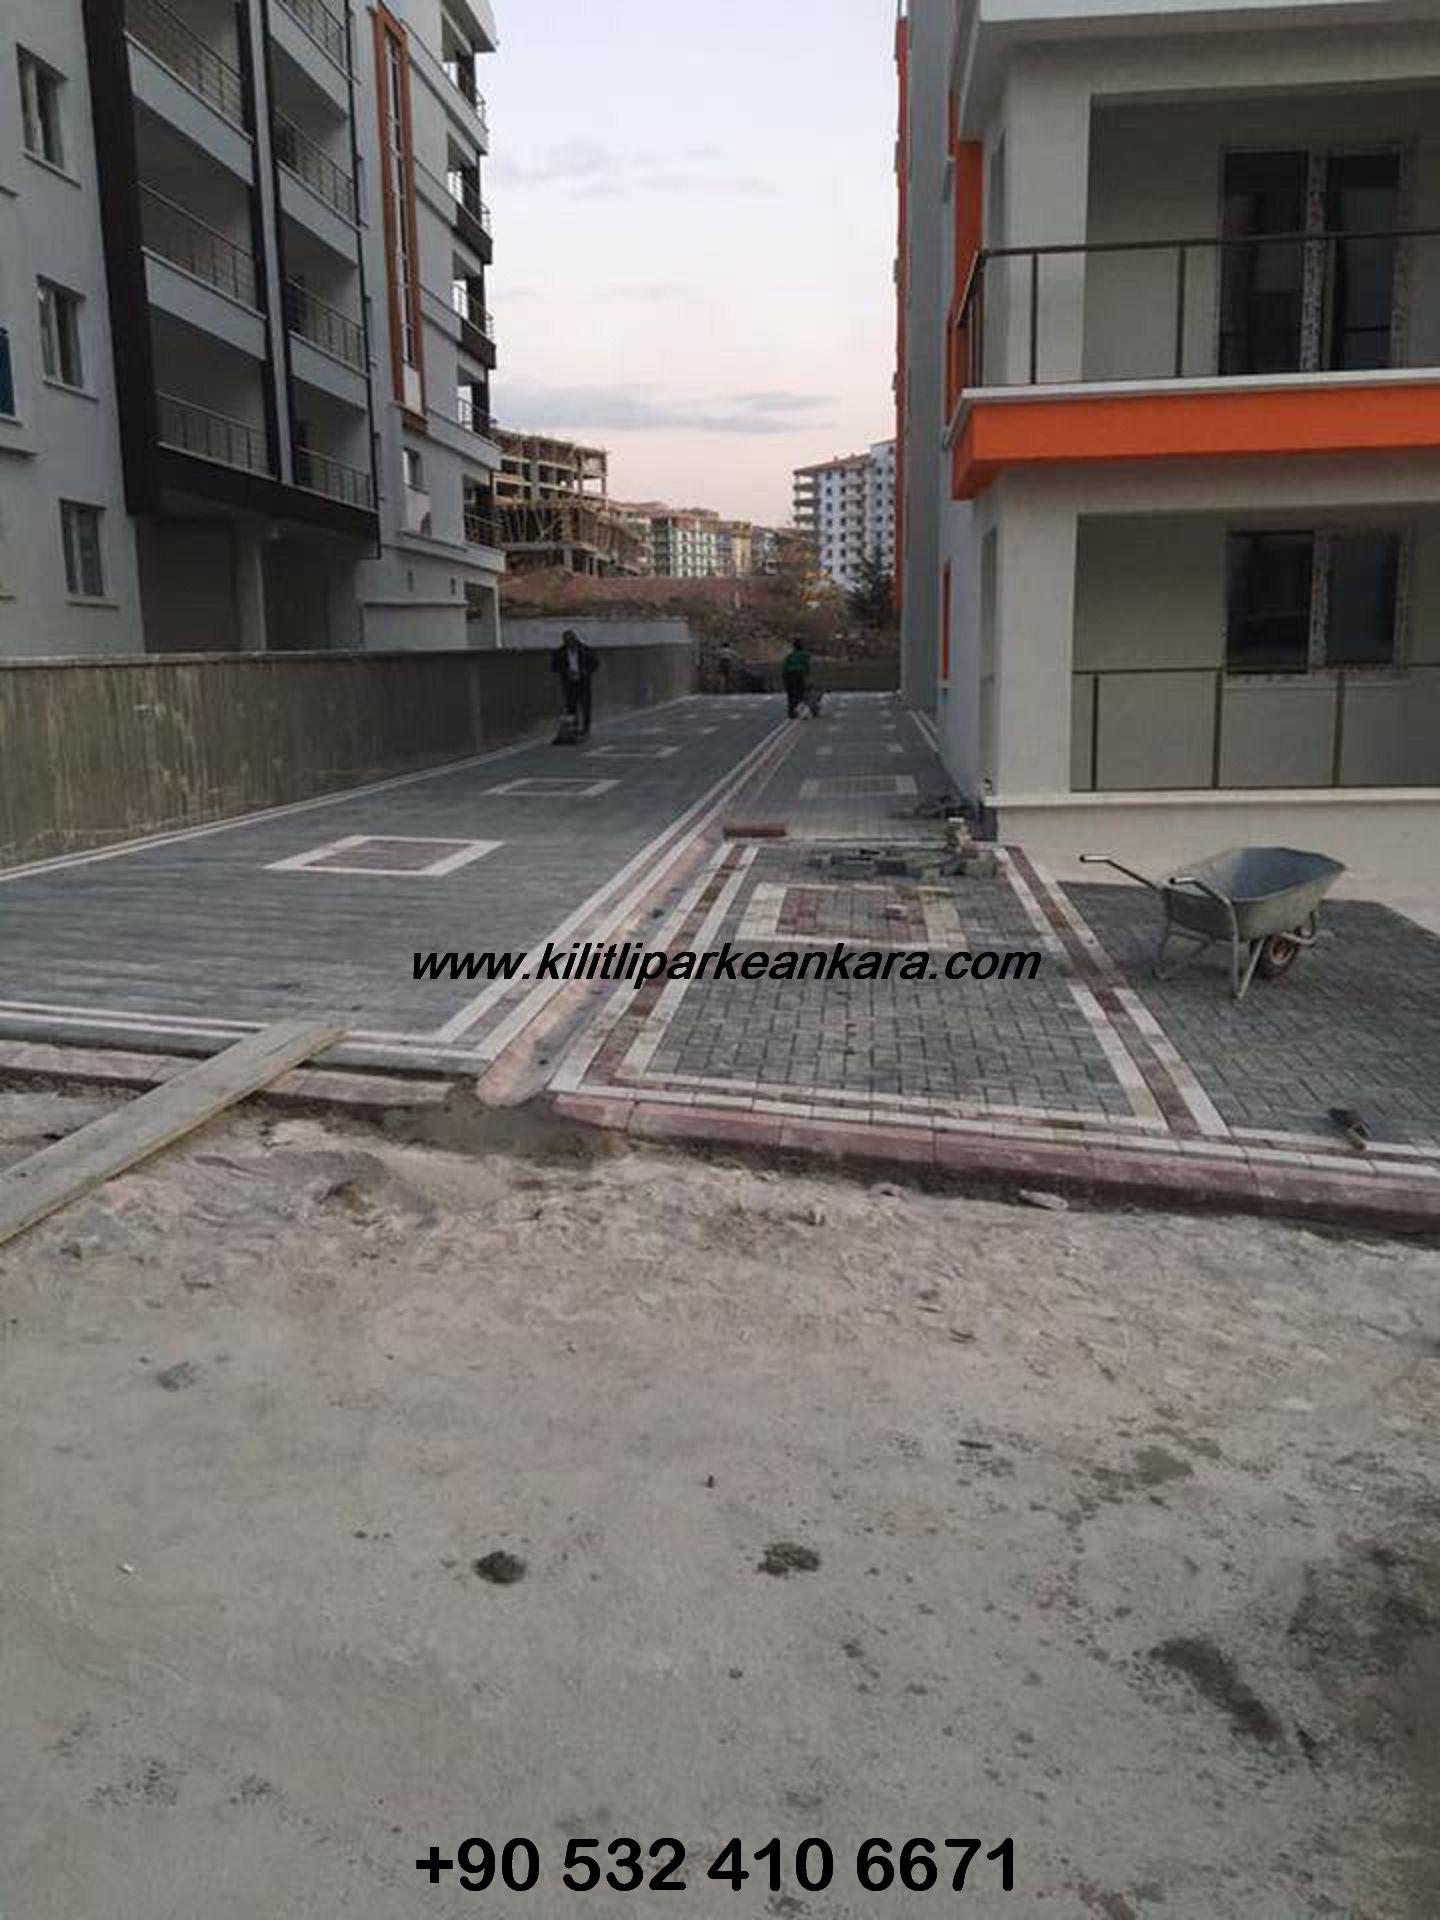 Ankara Kilit Taşı - Kilitli Parke Taşı Ustası (009)